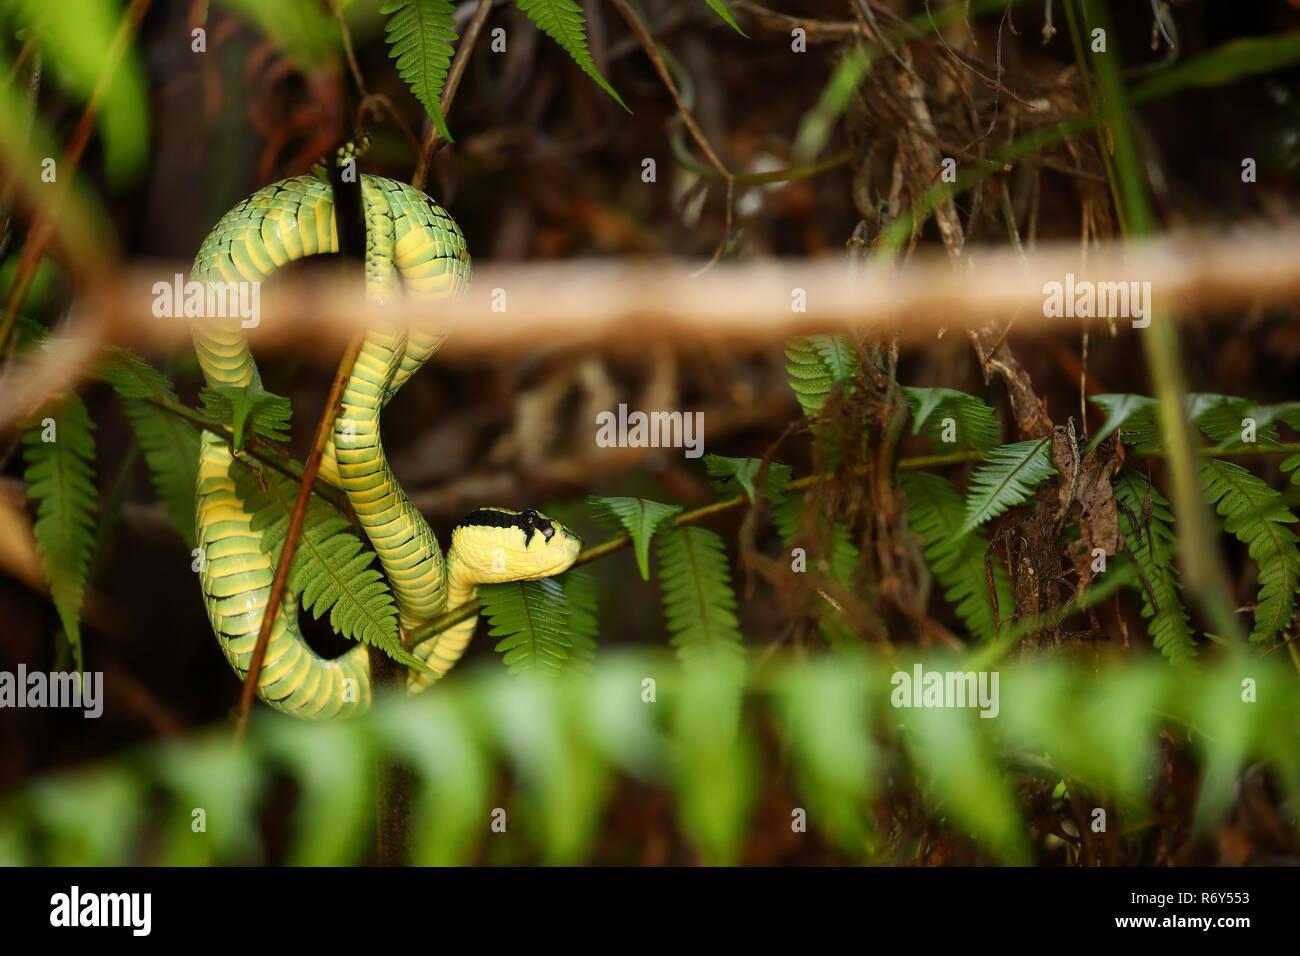 Grune Sri Lanka Bambusotter Stockfoto Bild 228019487 Alamy